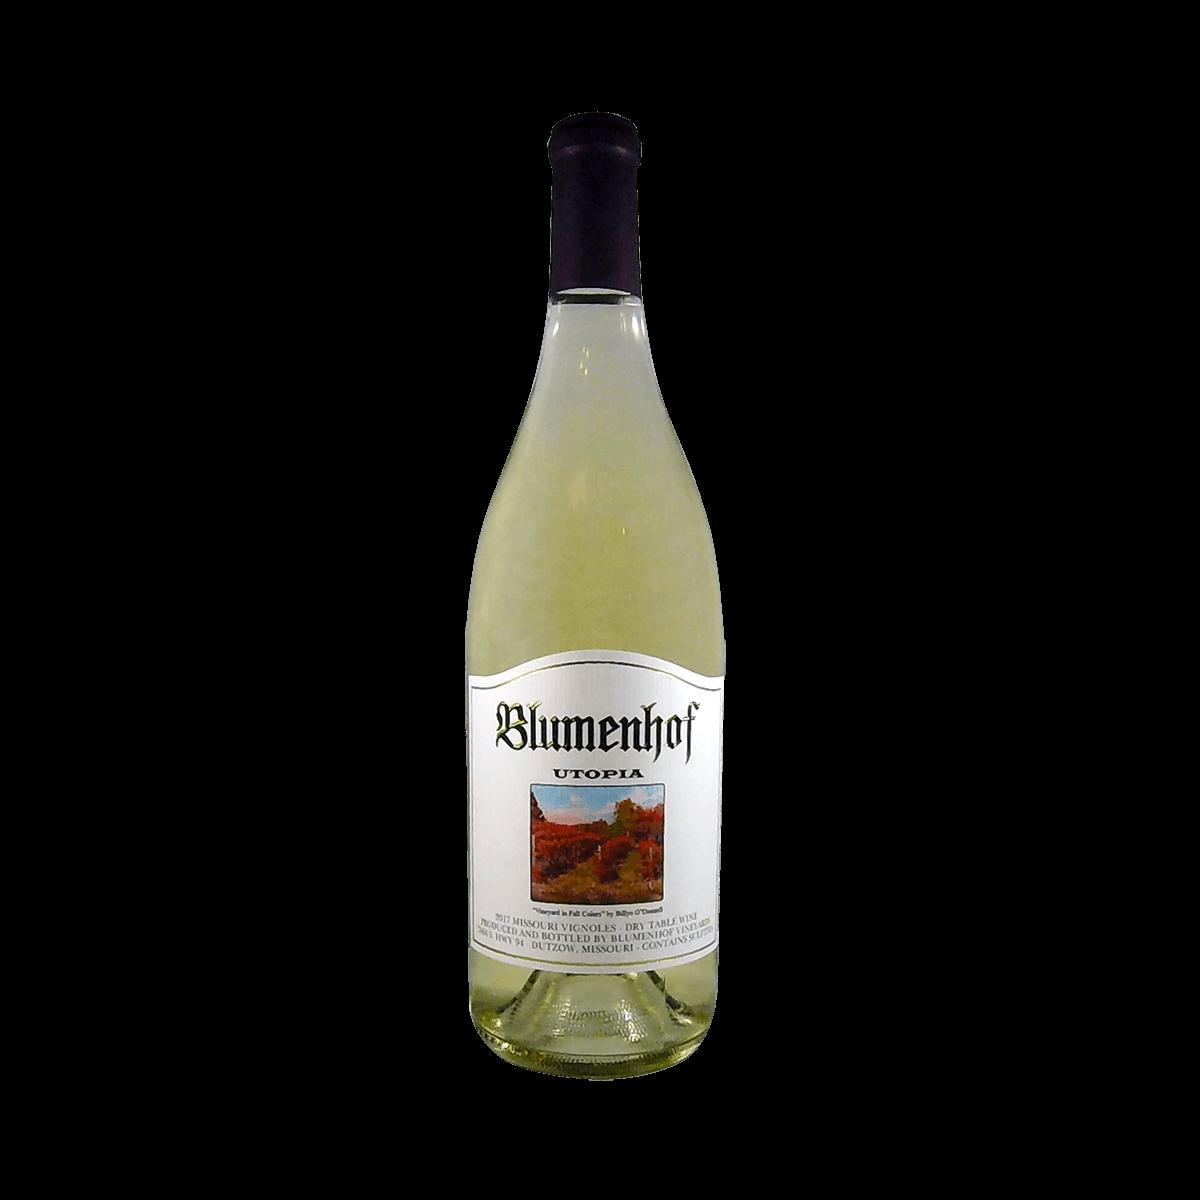 Bottle of Blumenhof Utopia